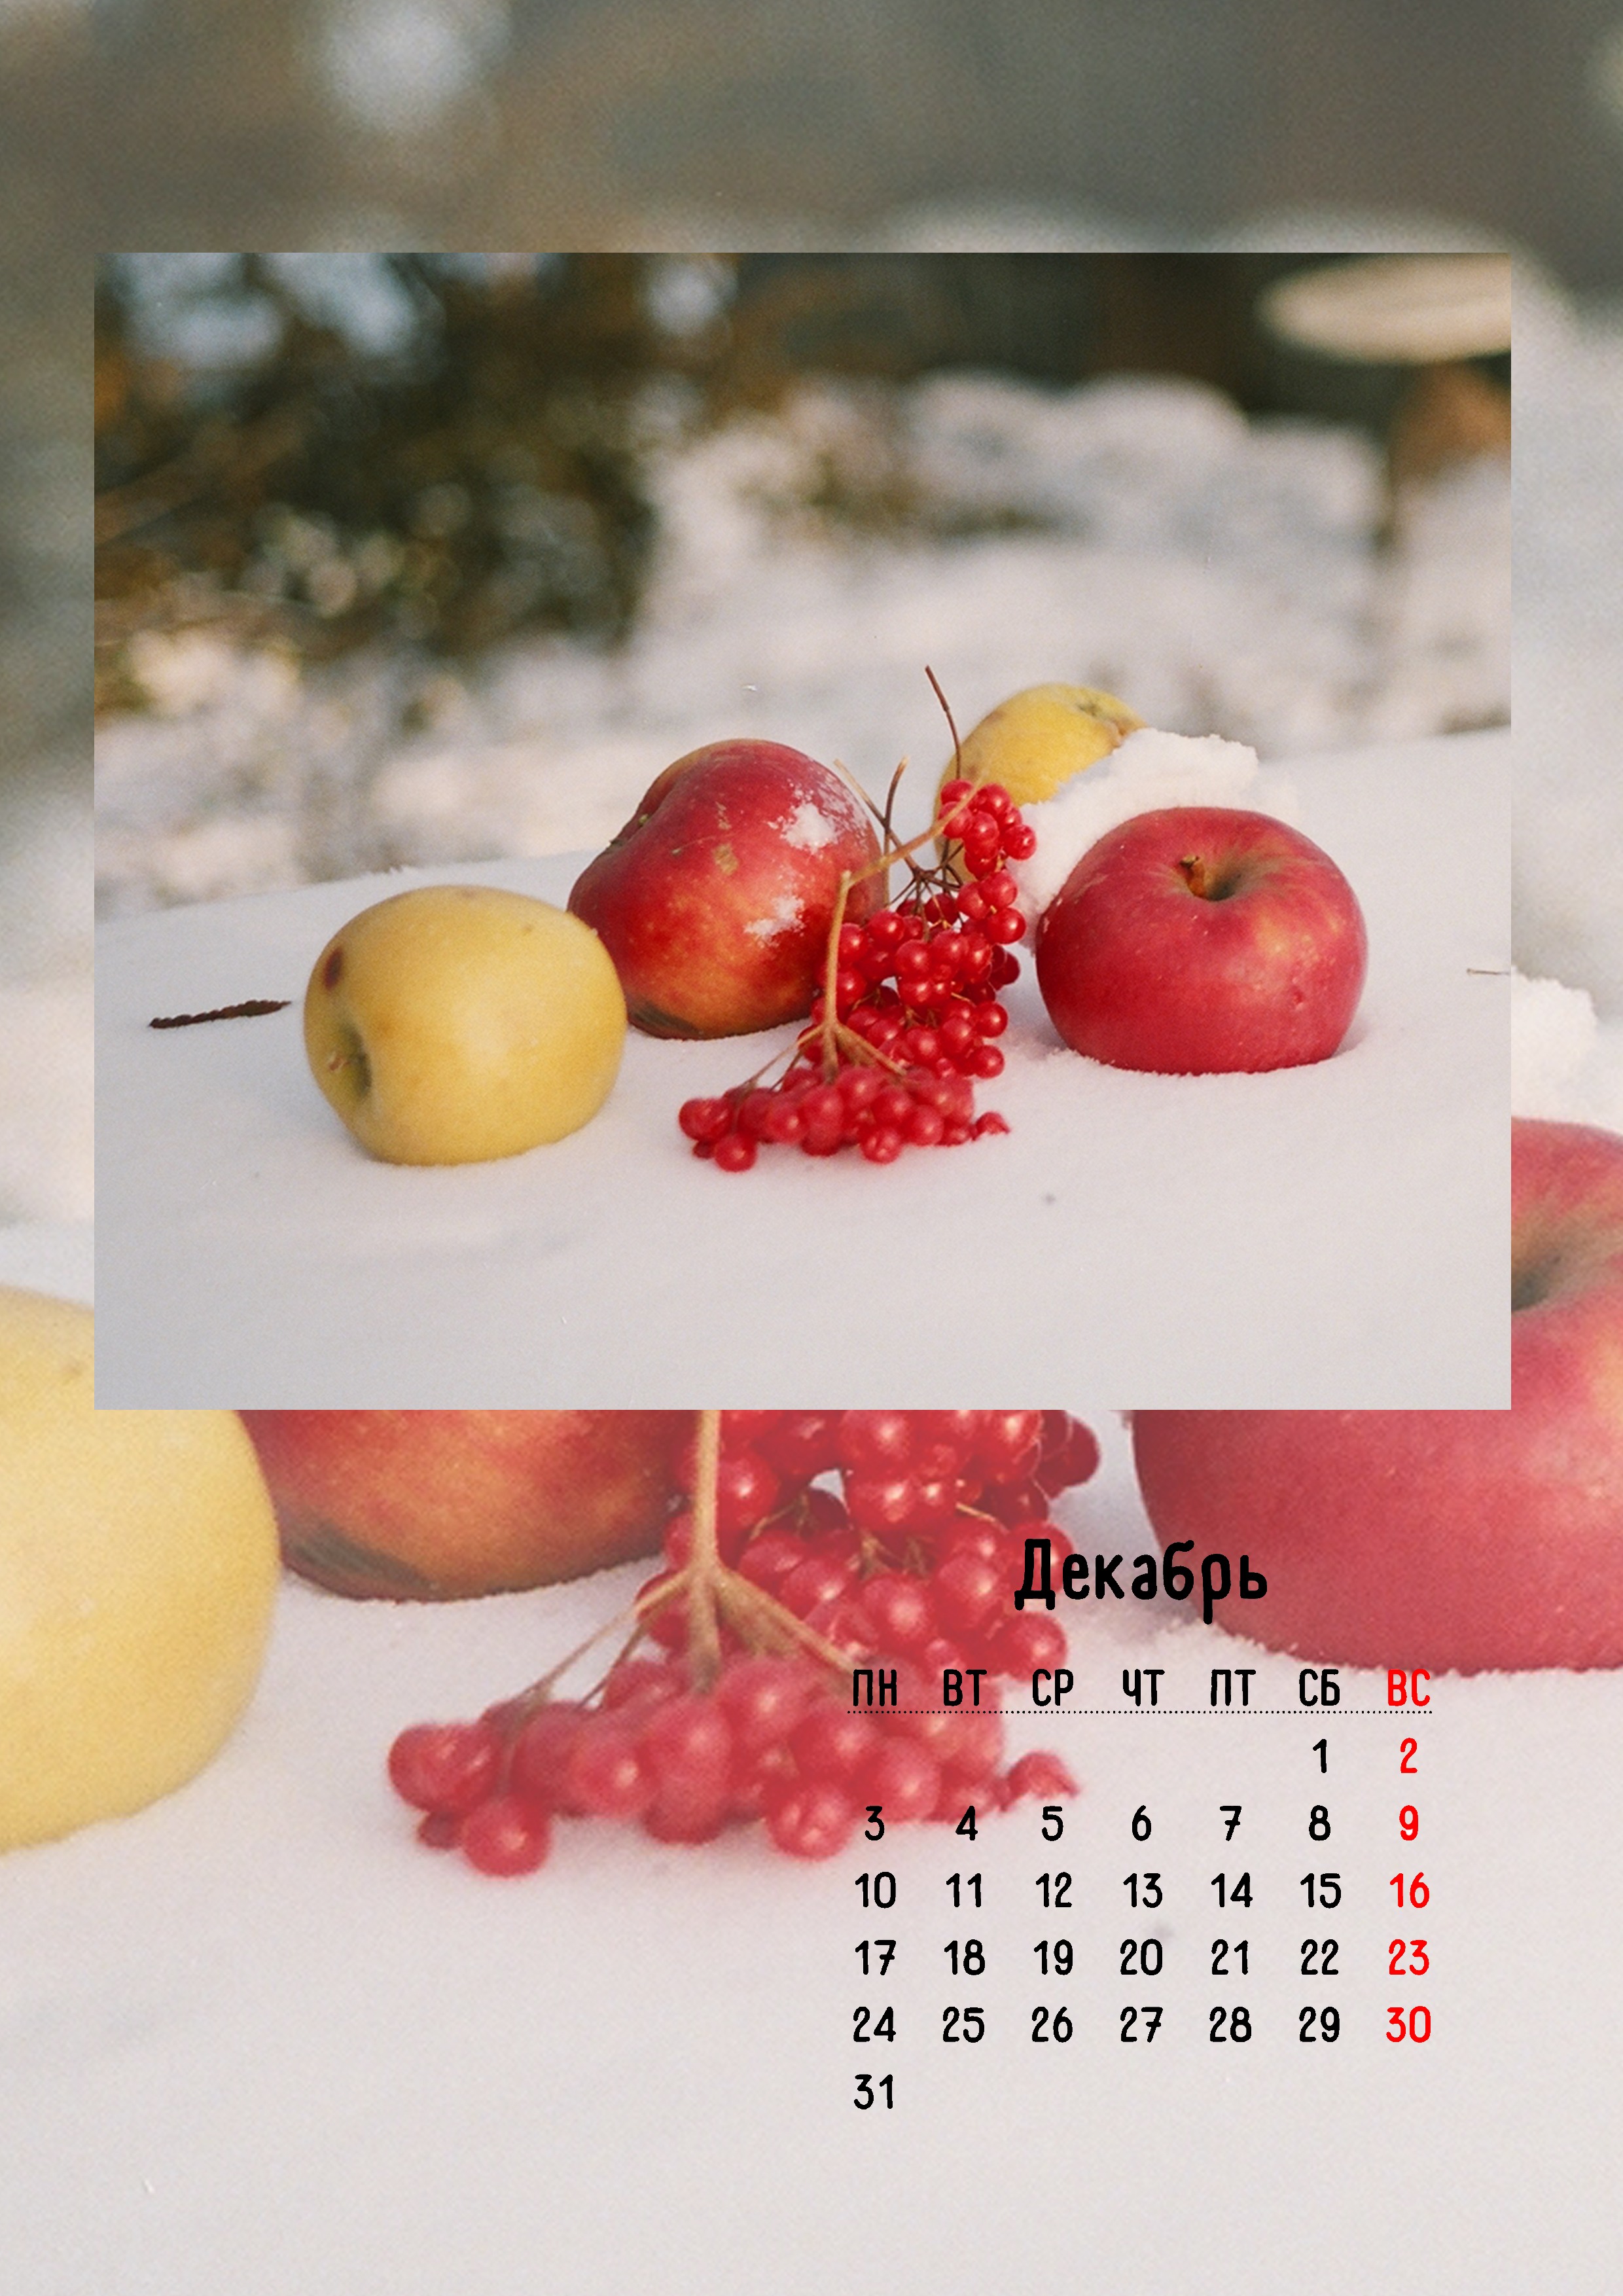 13. Календарь декабрь.jpg